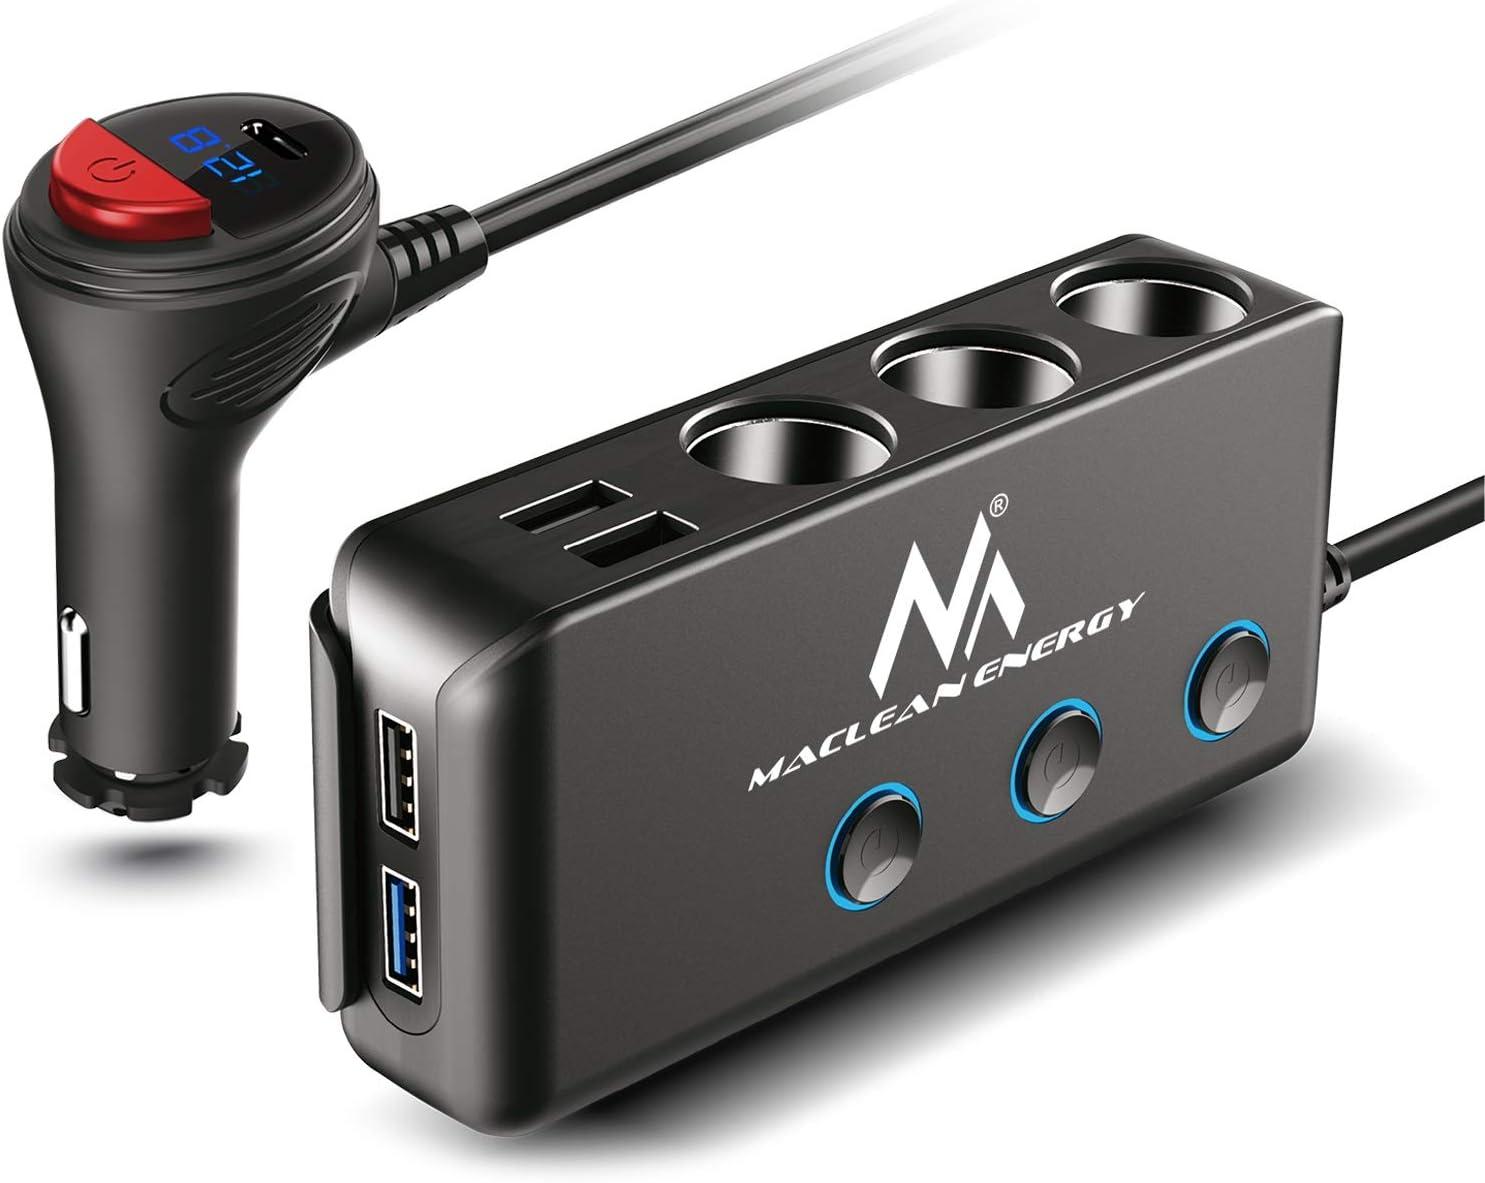 Maclean Mce218 3 Fach Kfz Verteiler Zigarettenanzünder Adapter 1xqc3 0 3xusb Anschlüsse Led Voltmeter Max 120w Ladegerät Power Delivery 18w Navigation